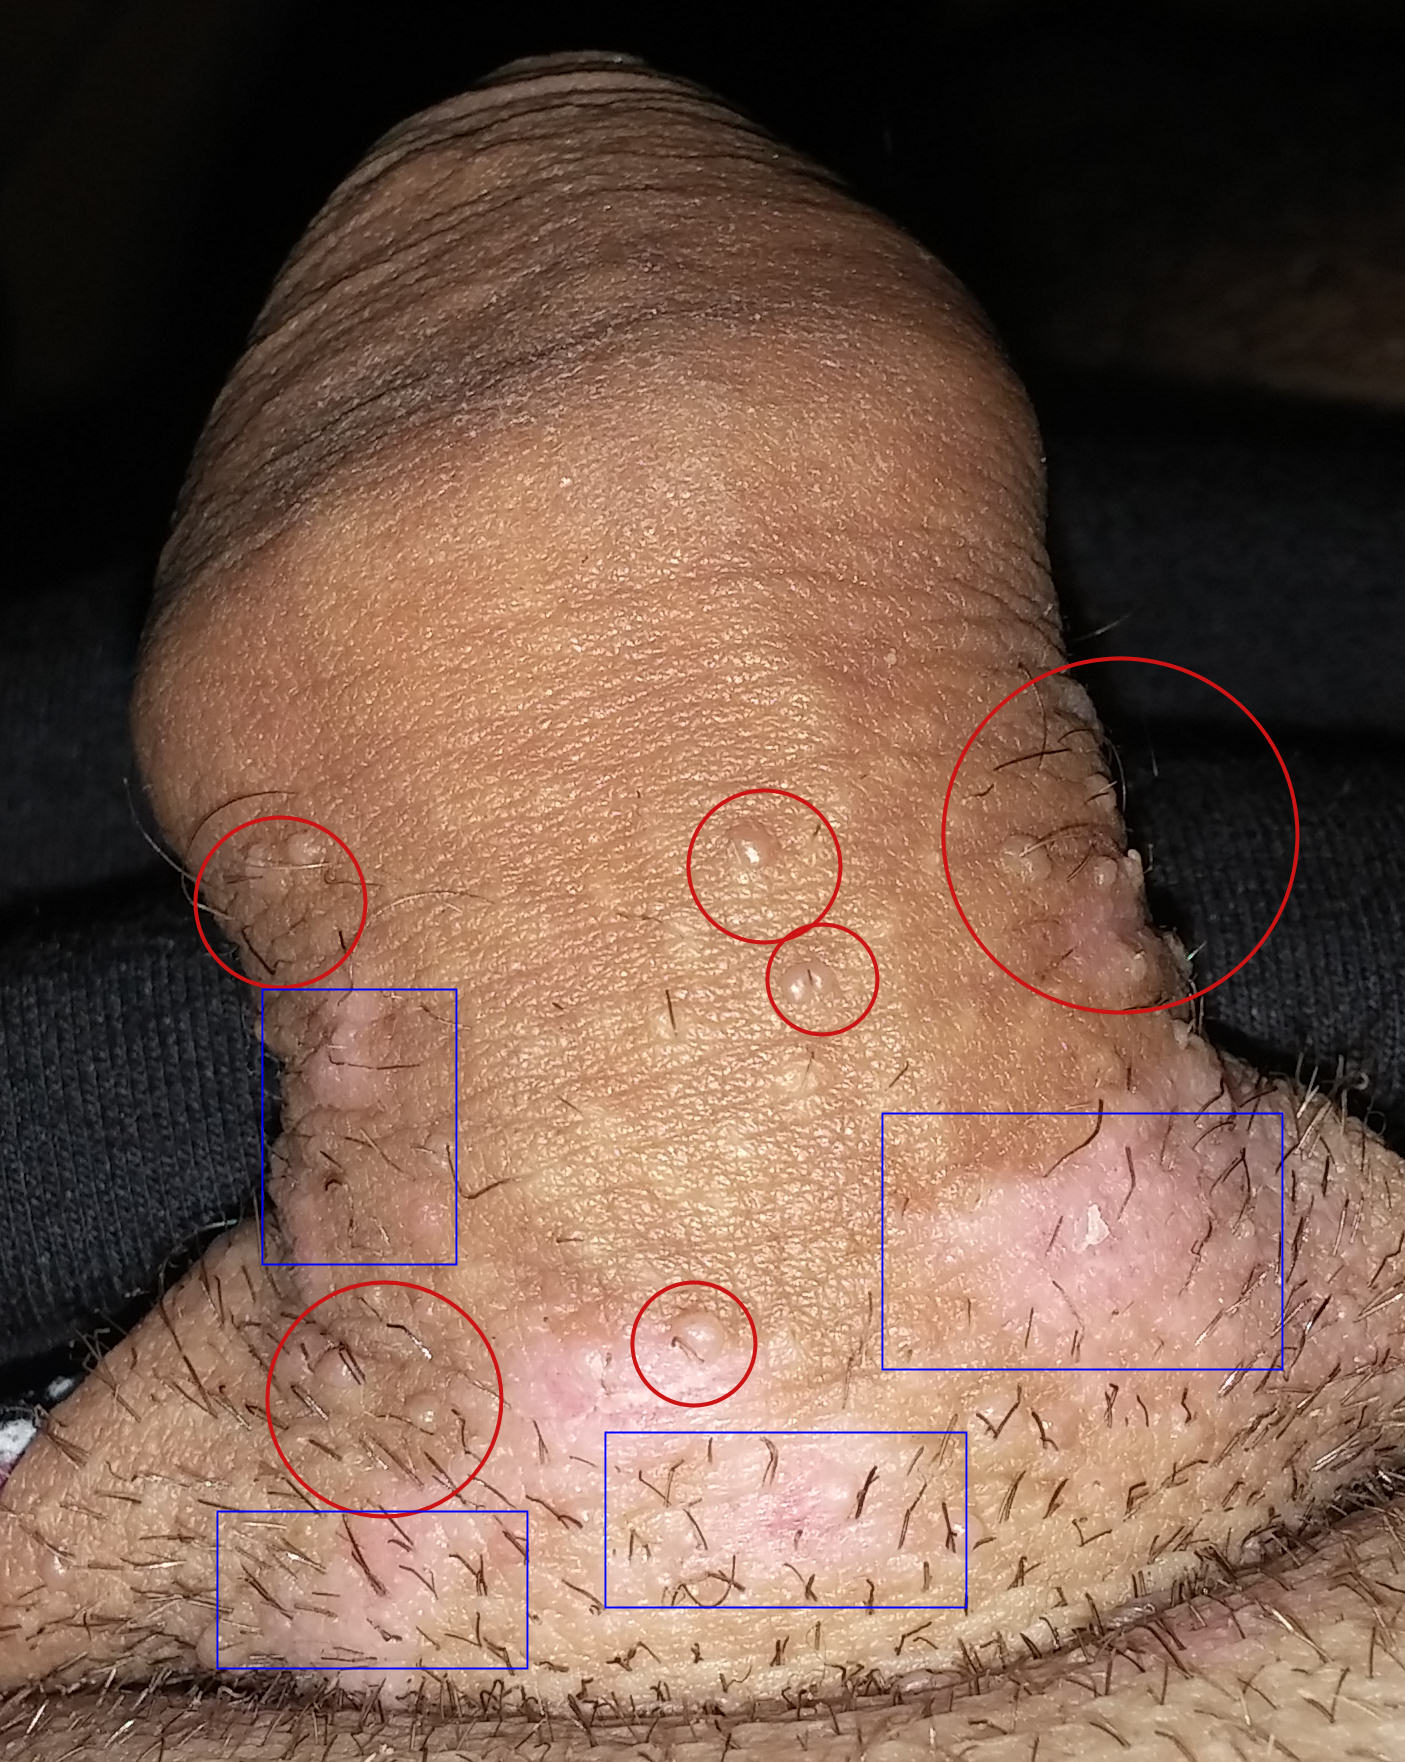 verrue papillomavirus femme parasitos oxiuros causas